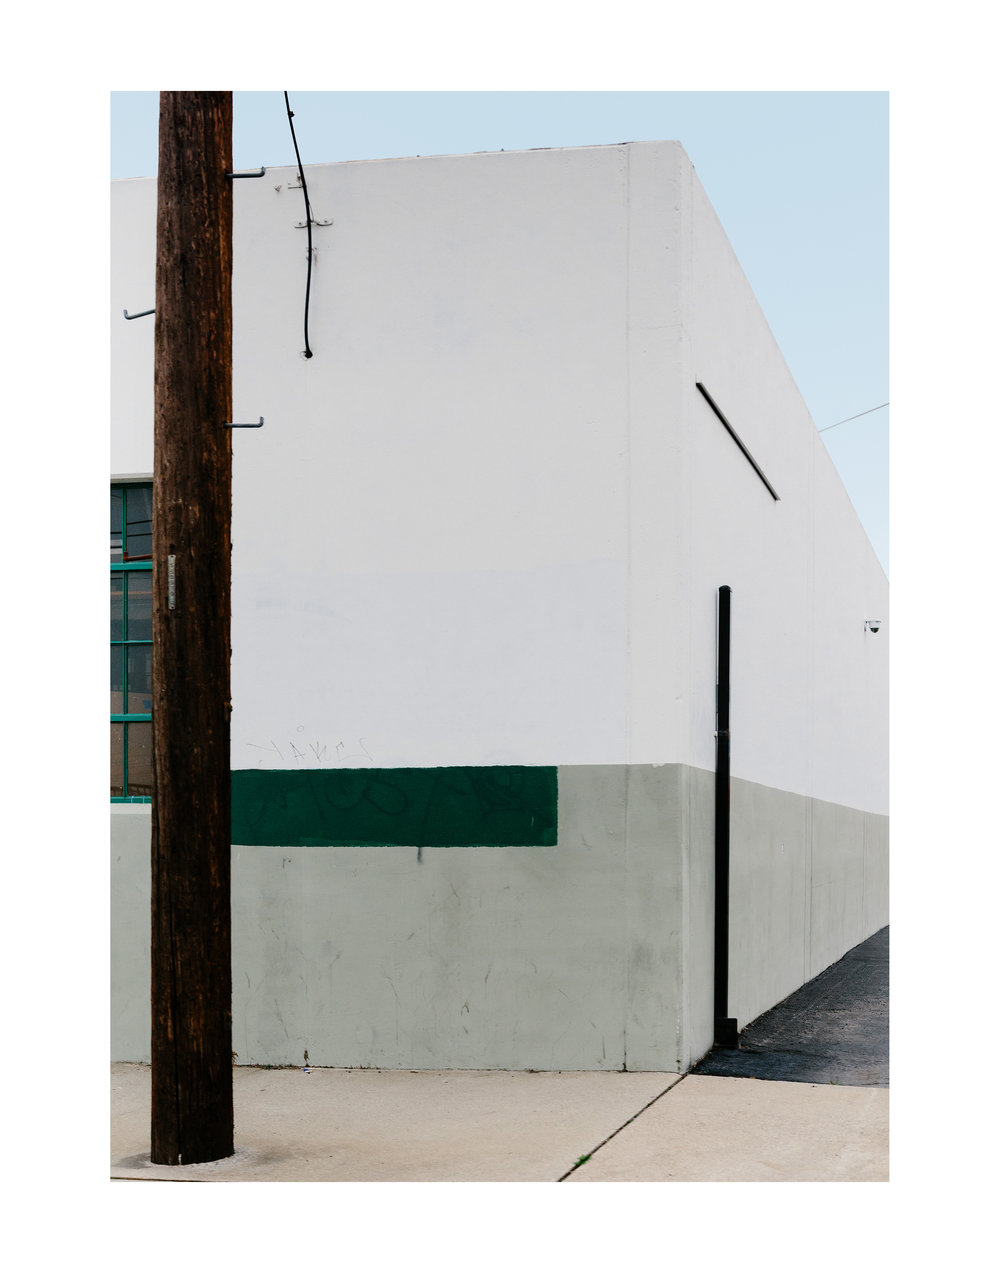 Minimal Hardscapes/ Green; Vernon, CA 2017